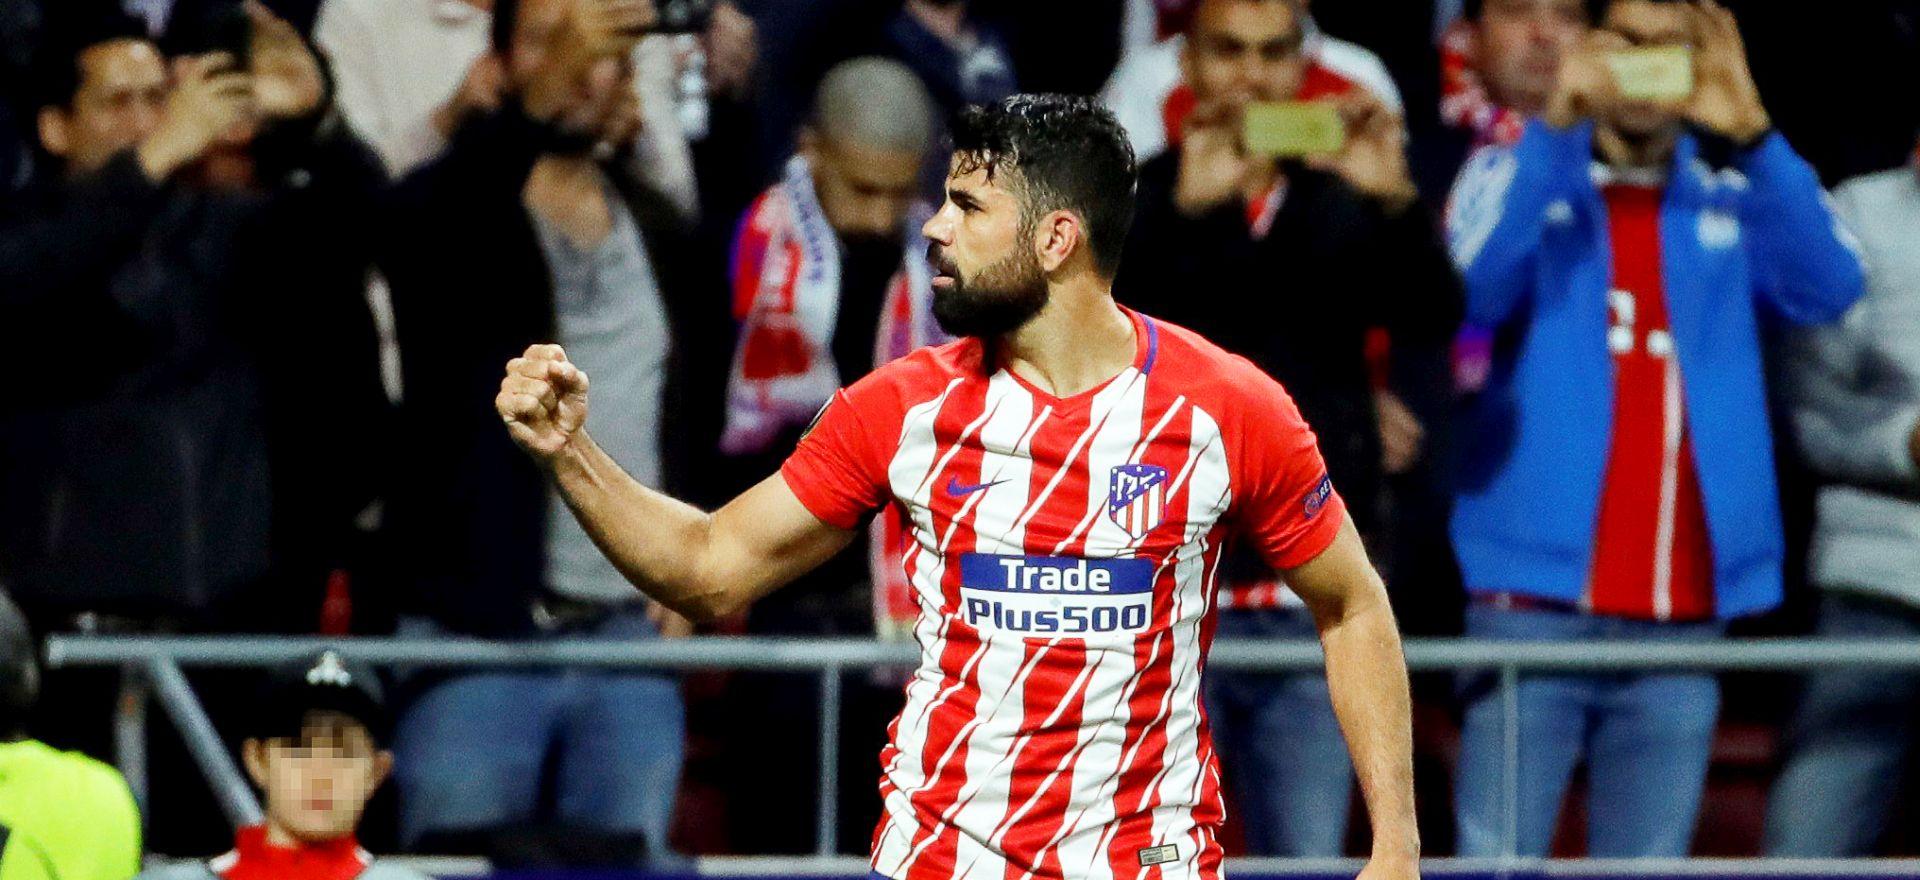 Costa otkazao Enriqeu zbog 'osobnih razloga'